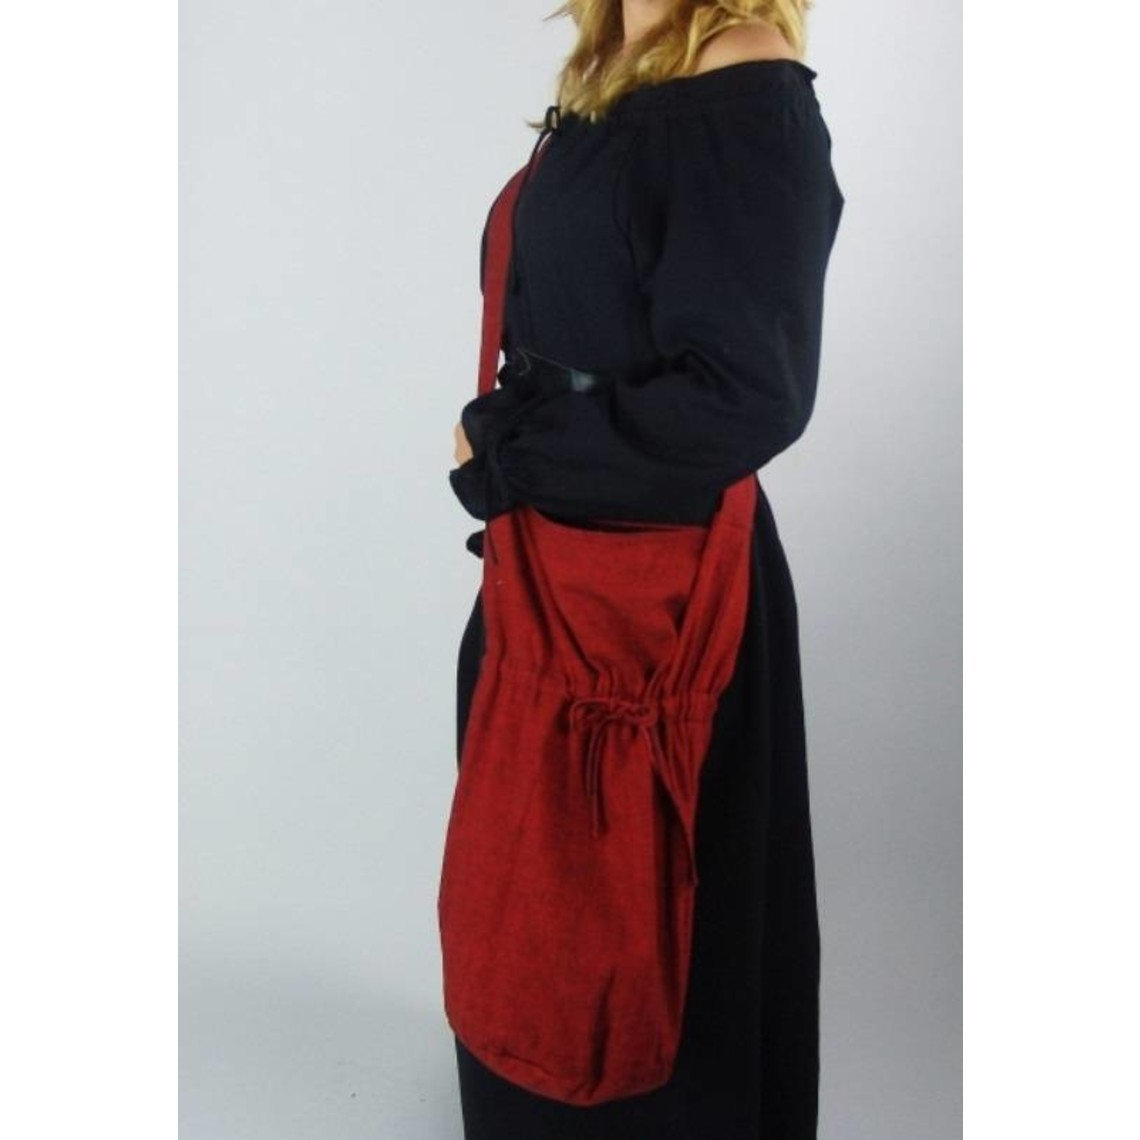 Leonardo Carbone Textilumhängetasche, rot